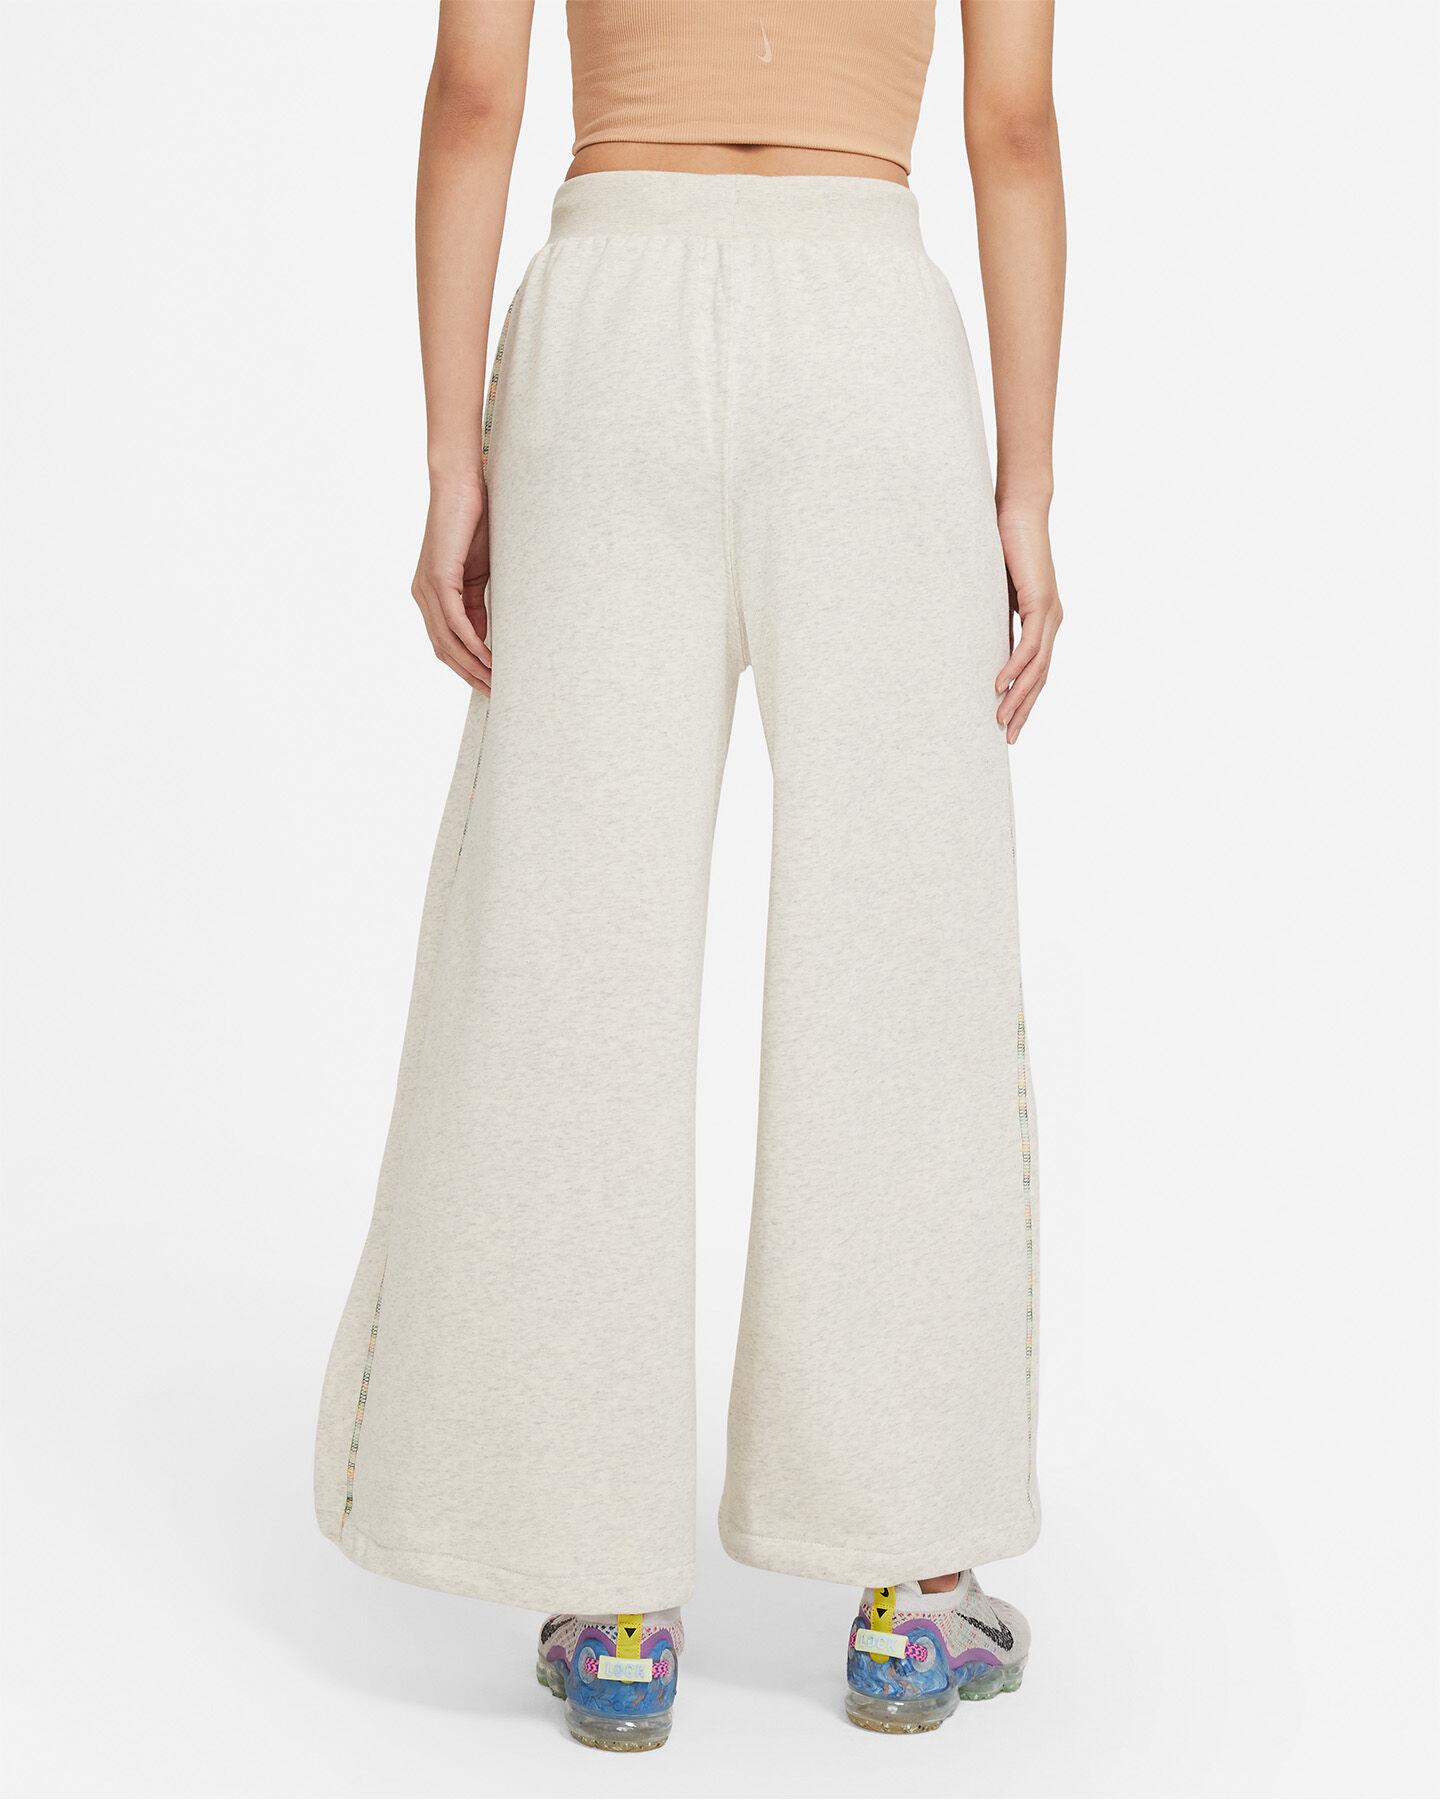 Pantalone NIKE EARTH DAY W S5269771 scatto 1